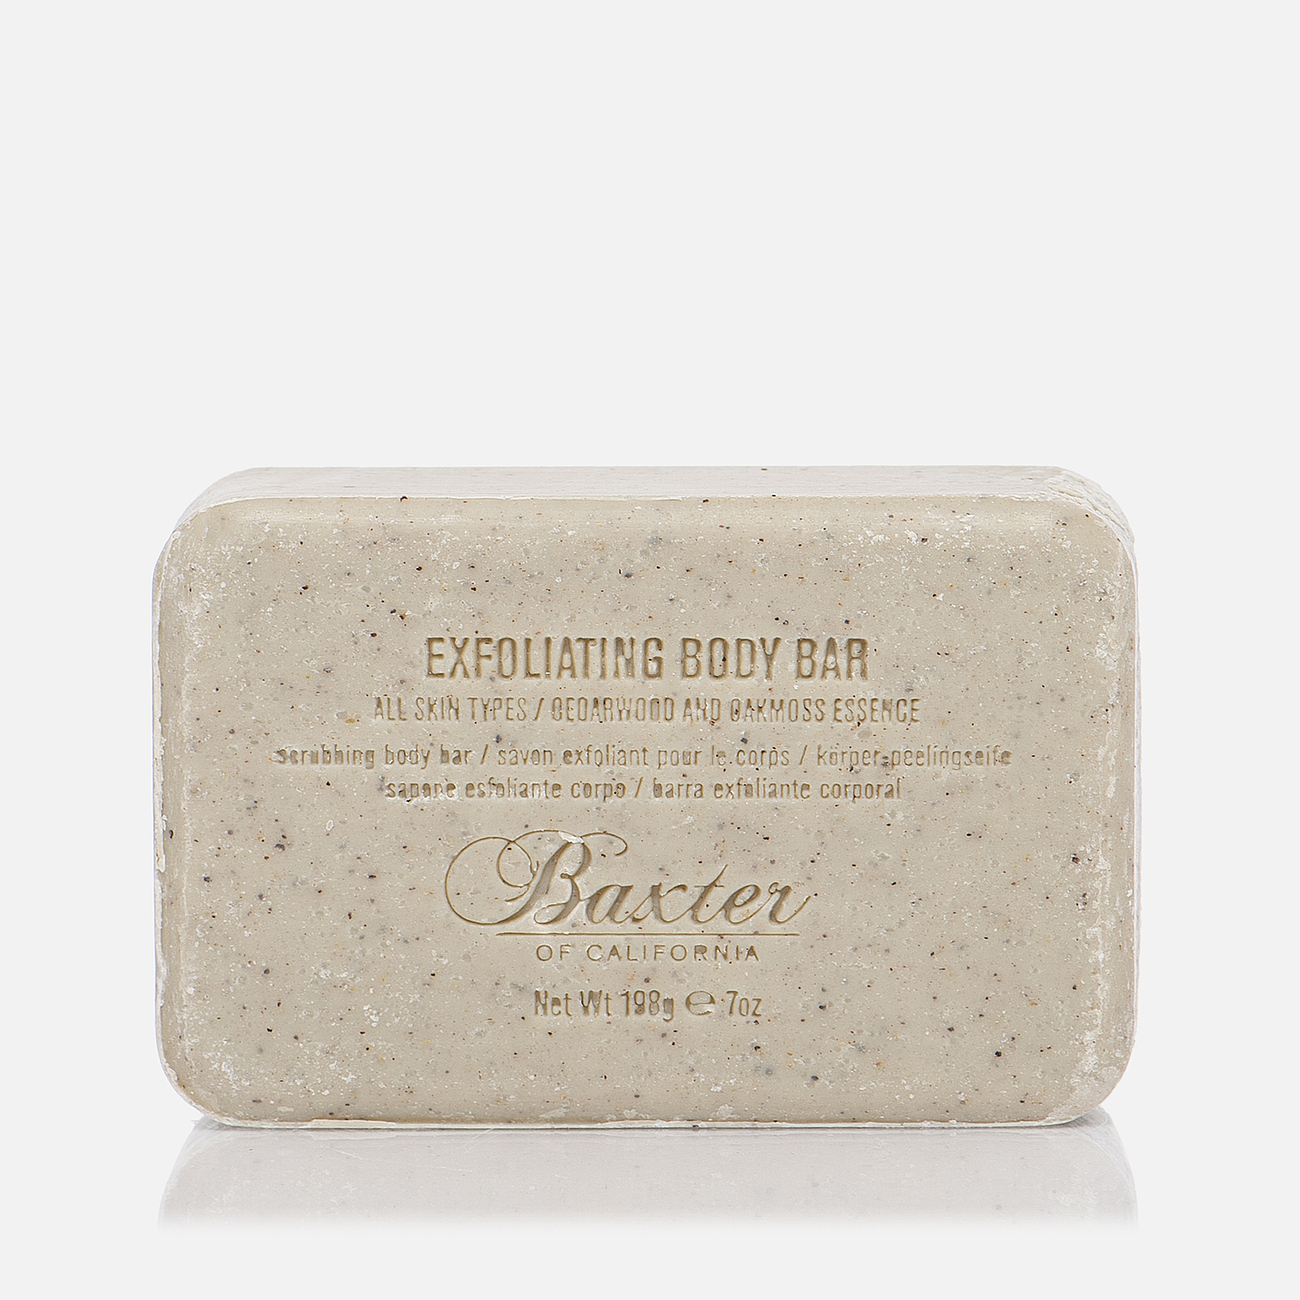 Мыло-скраб Baxter of California Exfoliating Body Bar 198g